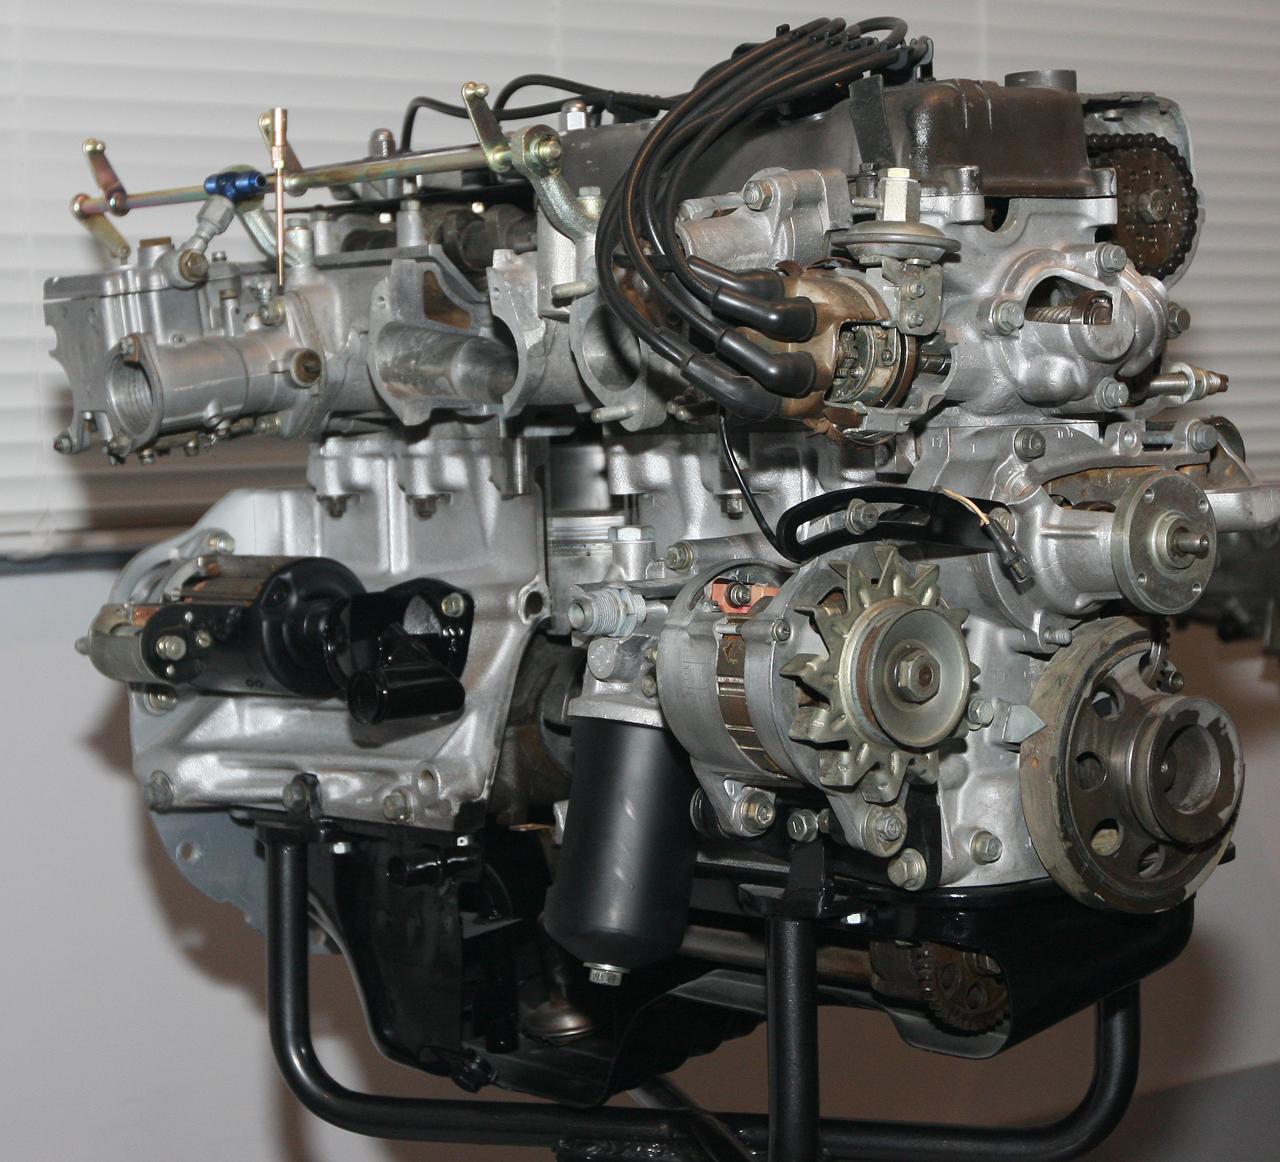 1969_Nissan_S20_engine_right.jpg